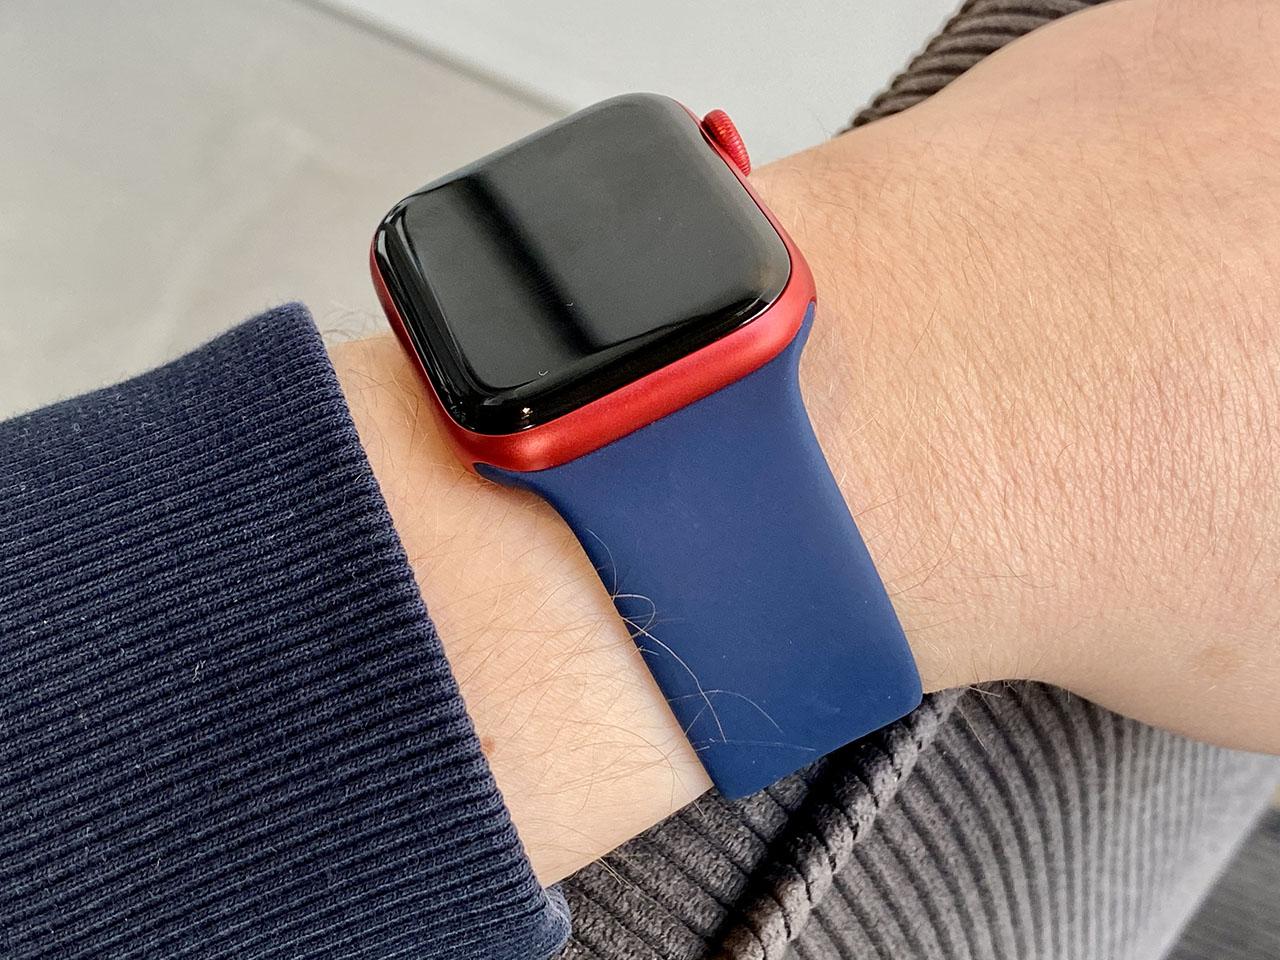 Apple Watch Series 6 met blauw en rood